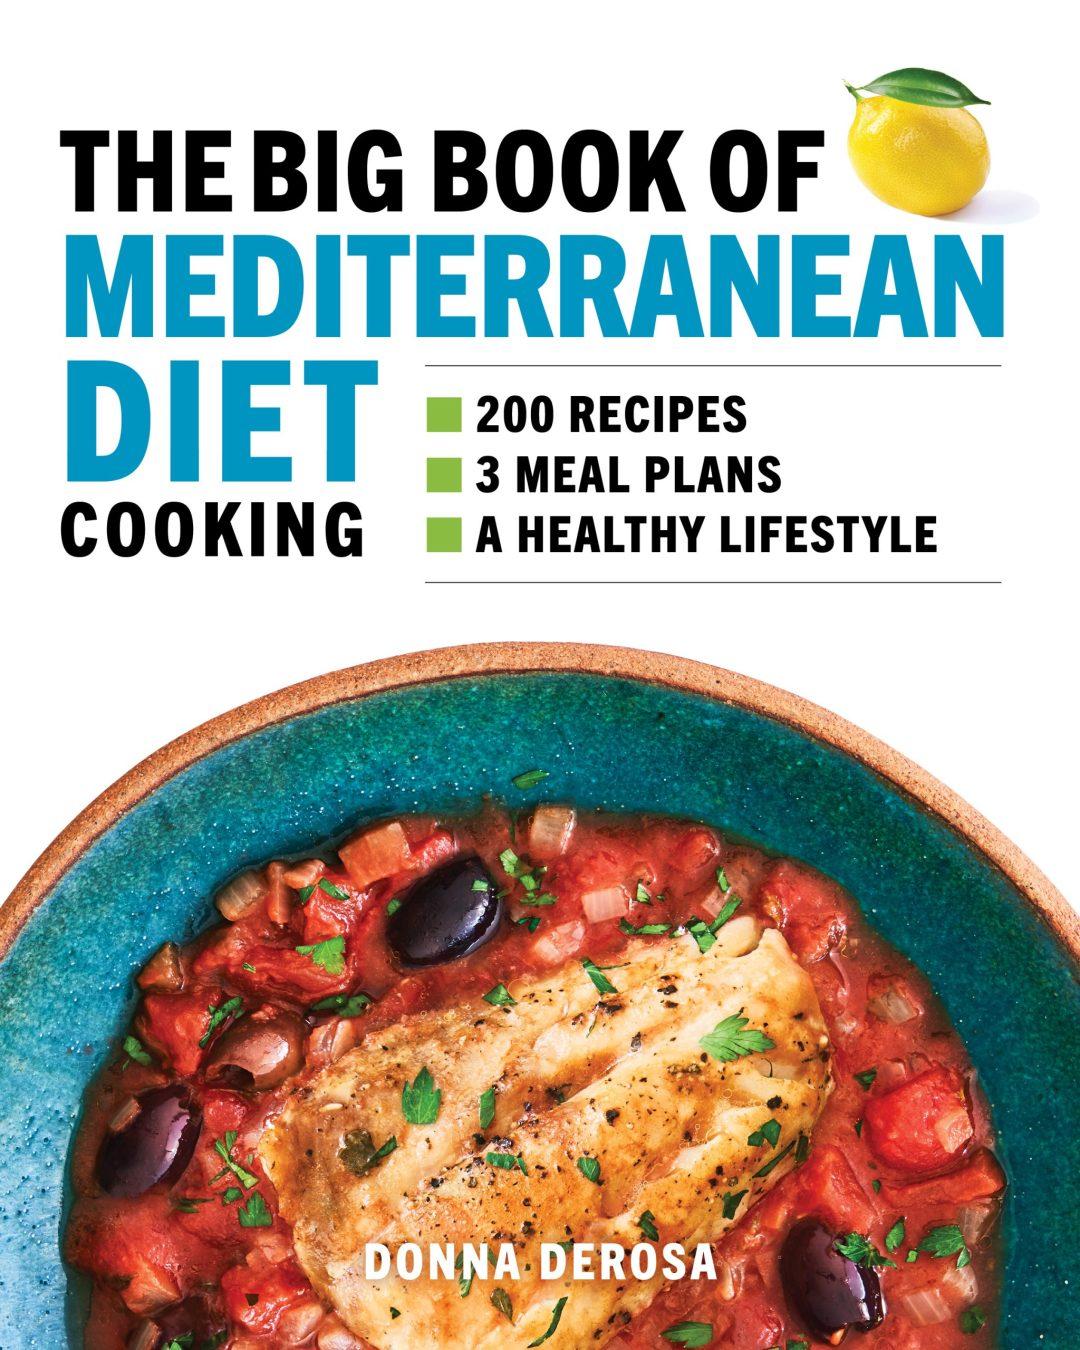 Big Book of Mediterranean Diet Cooking